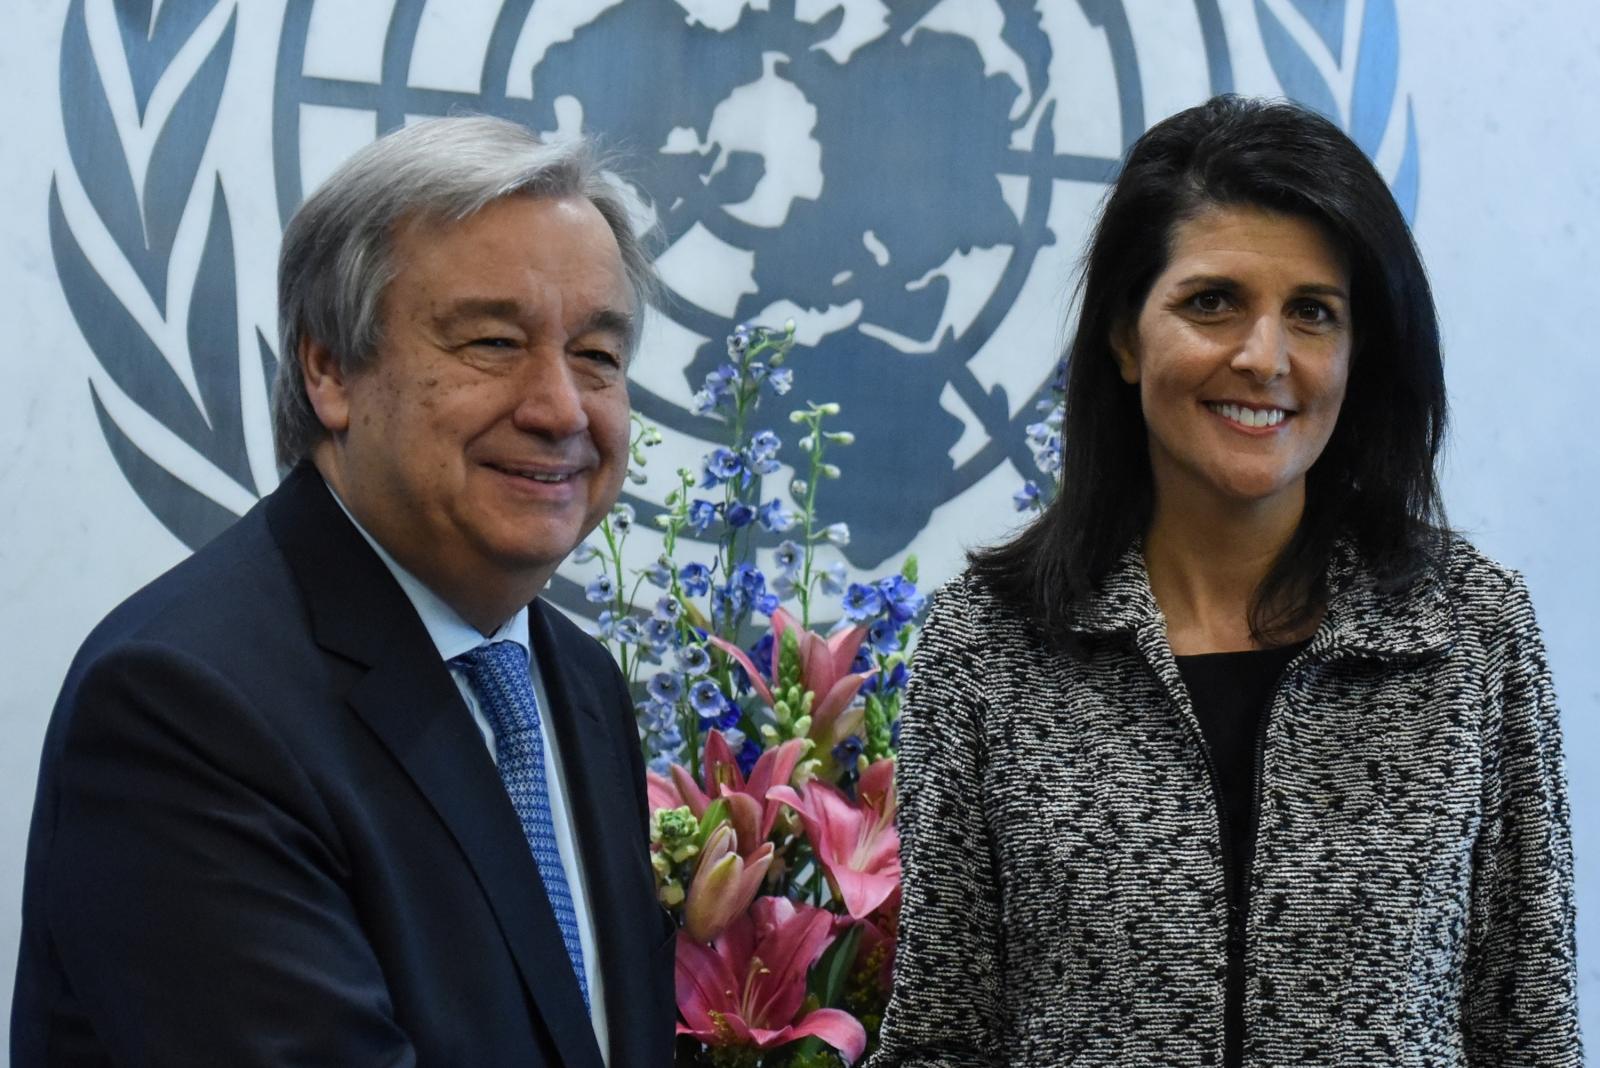 Antonio Guterres, Nikki Haley